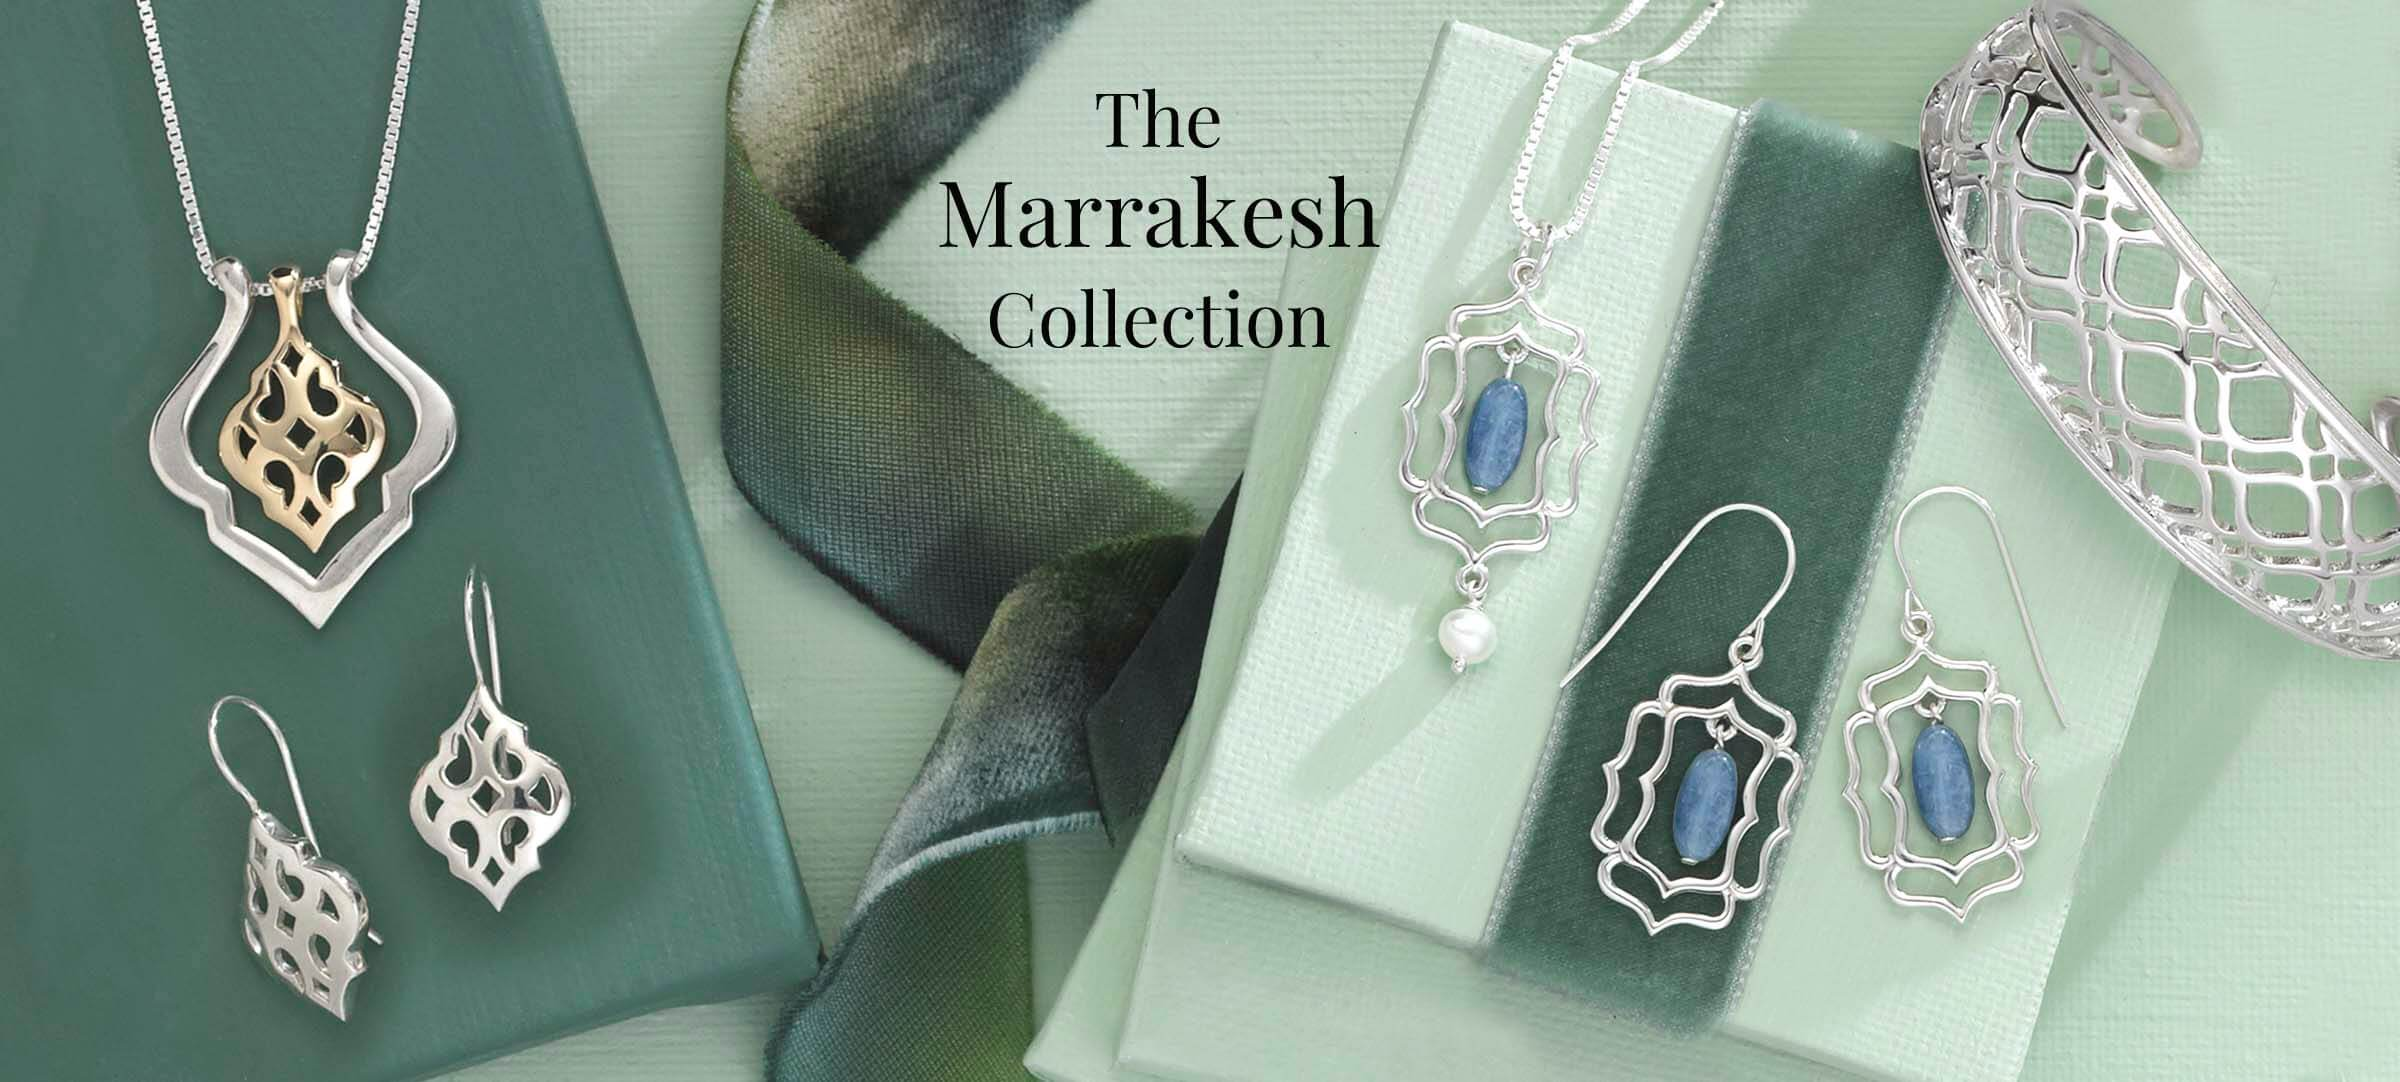 marrakesh-reduced.jpg